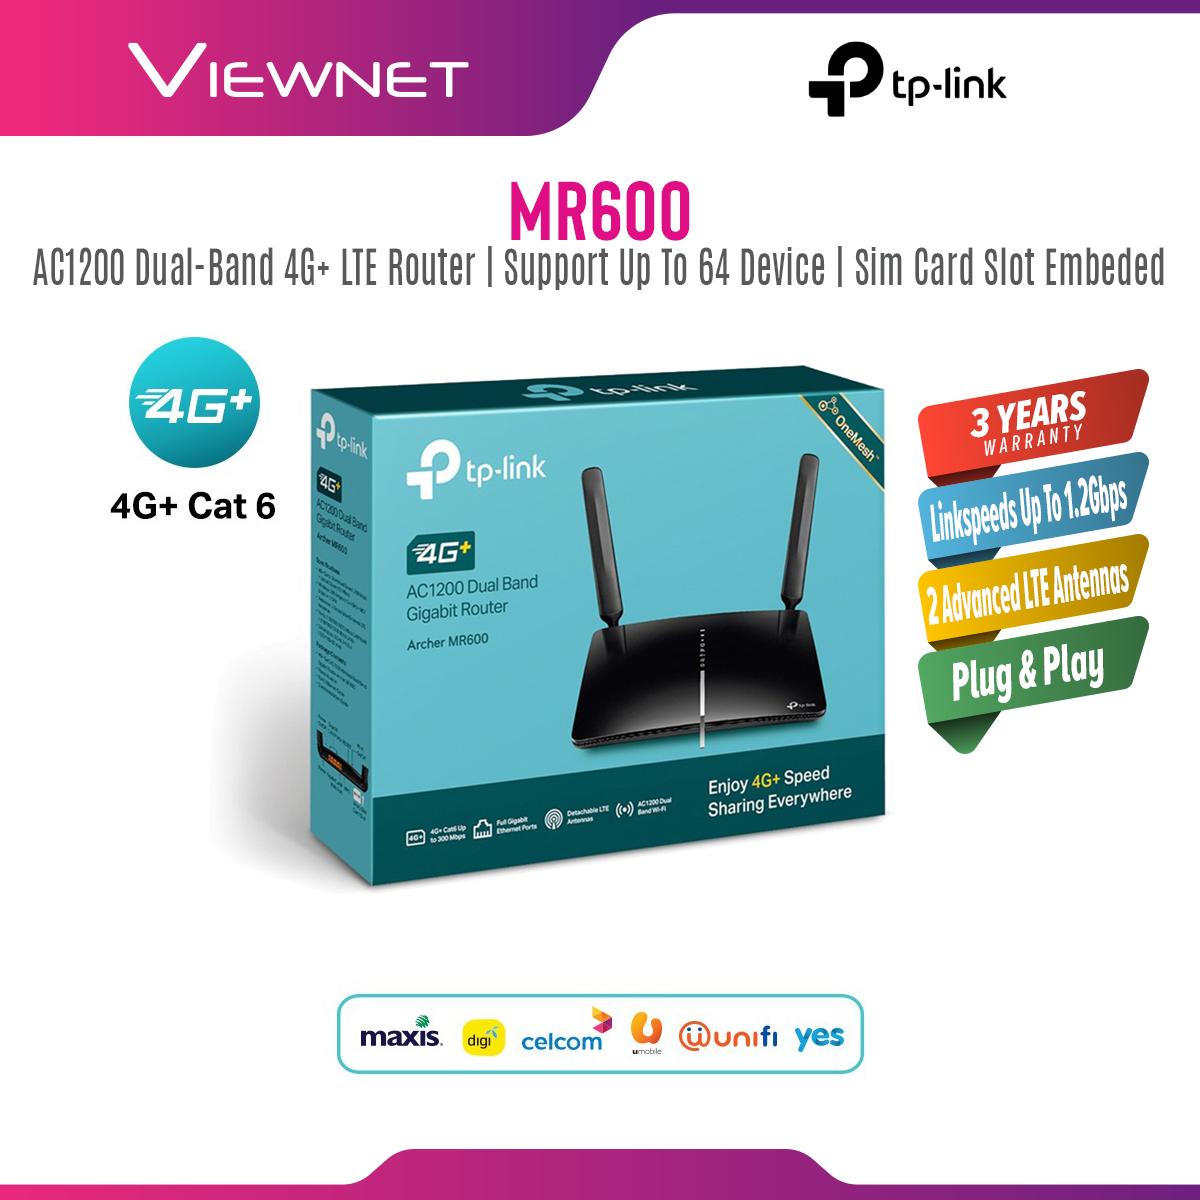 TP-Link Archer MR600 4G+ CAT6 AC1200 Dual Band Gigabit SIM Modem Wireless Mesh WiFi Router 2.4GHz+5GHz